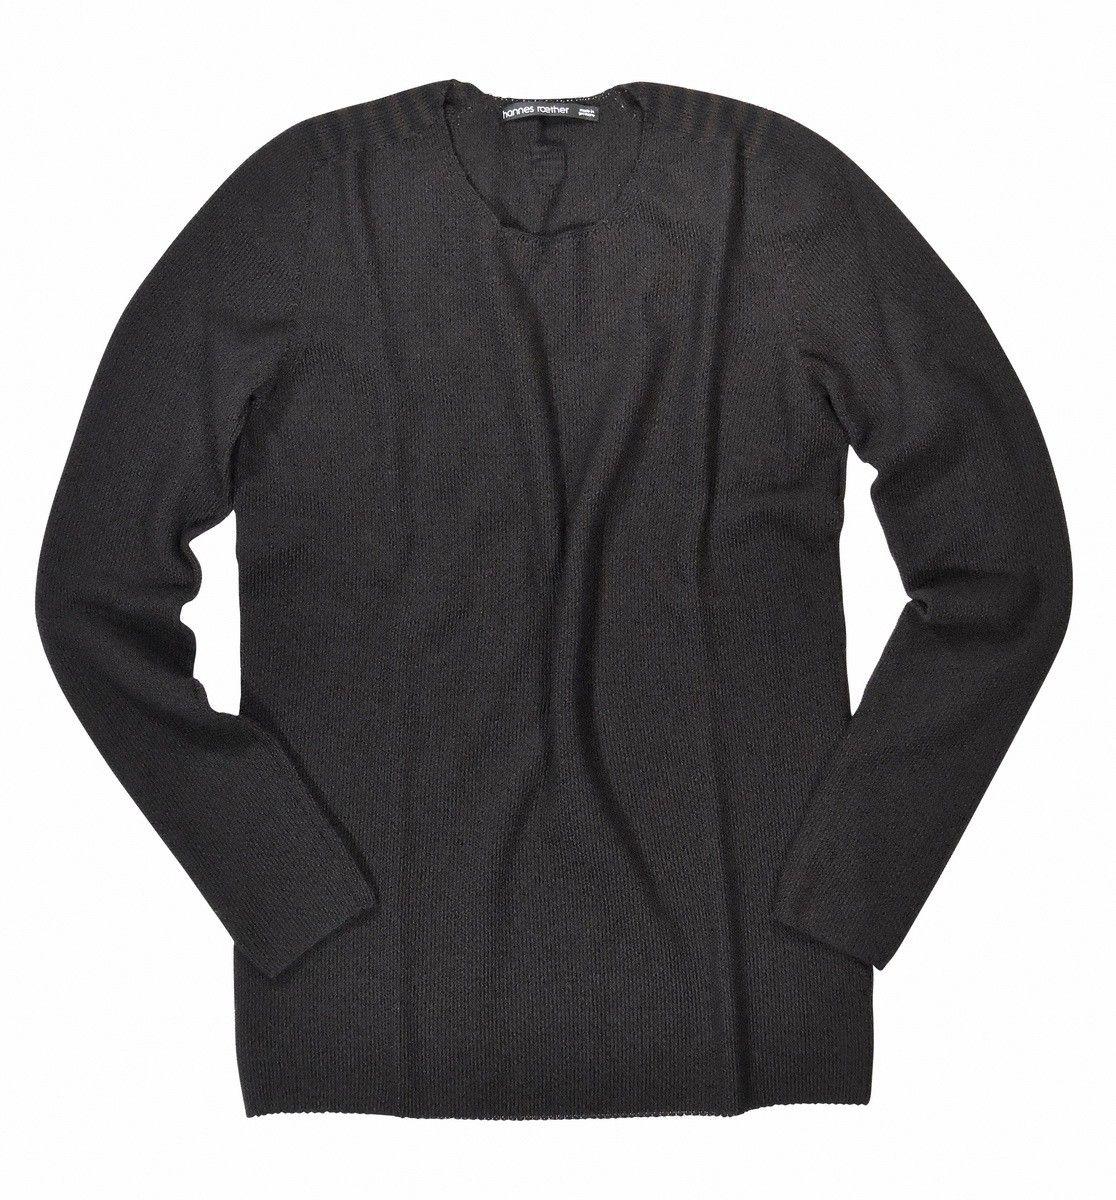 HANNES ROETHER - Herren Pullover - Agile - Black/Farn